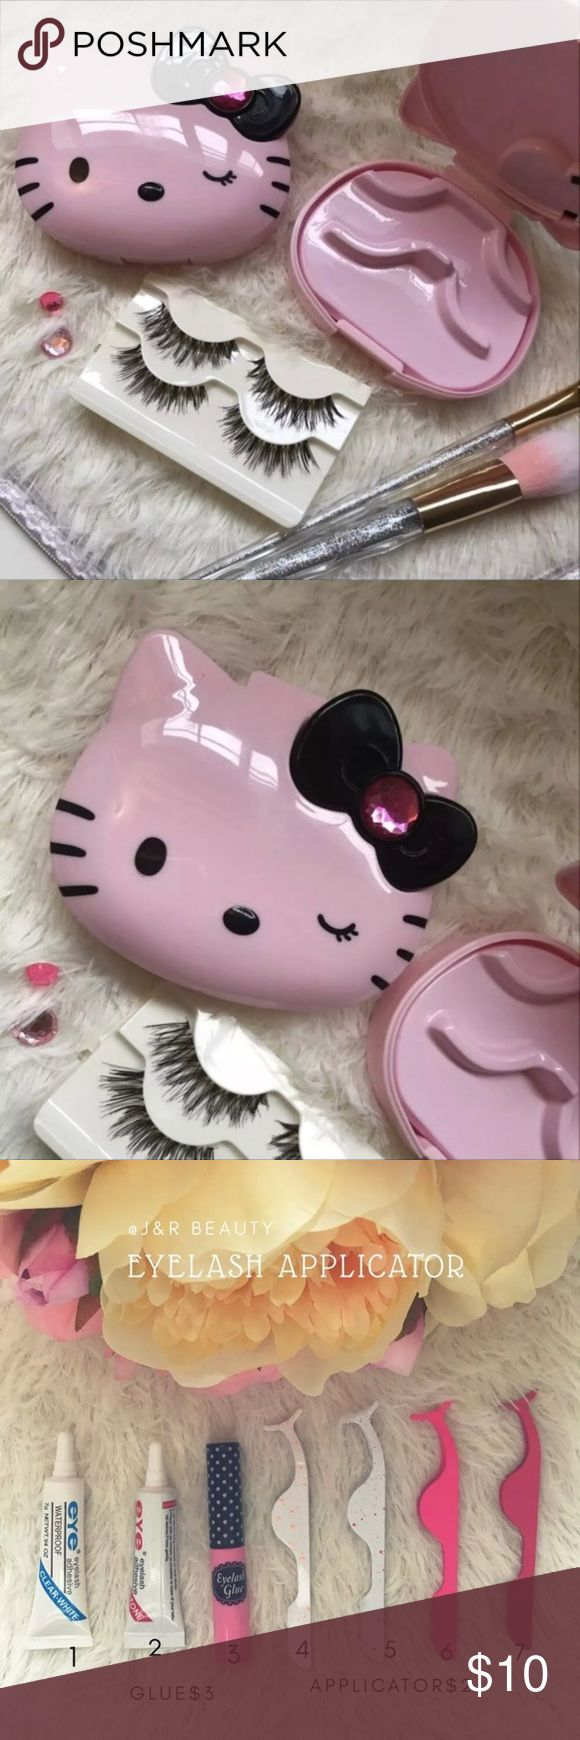 Hello kitty eyelash case + wispy Eyelashes Include  ❣️Hello kitty eyelash case ❣️2 wispy lashes  +$2 Add on eyelash Applicator  +$3 Add on eyelash glue Please message me if you want to add them.    # tags Iconic, mink, red cherry eyelashes, house of lashes, doll, kawaii, case, full, natural,  Koko, Ardell, wispies, Demi , makeup,Sanrio, hello kitty, pill case, eyelash  Last 1 ✨❣️❤️⭐️ Hello Kitty Makeup False Eyelashes